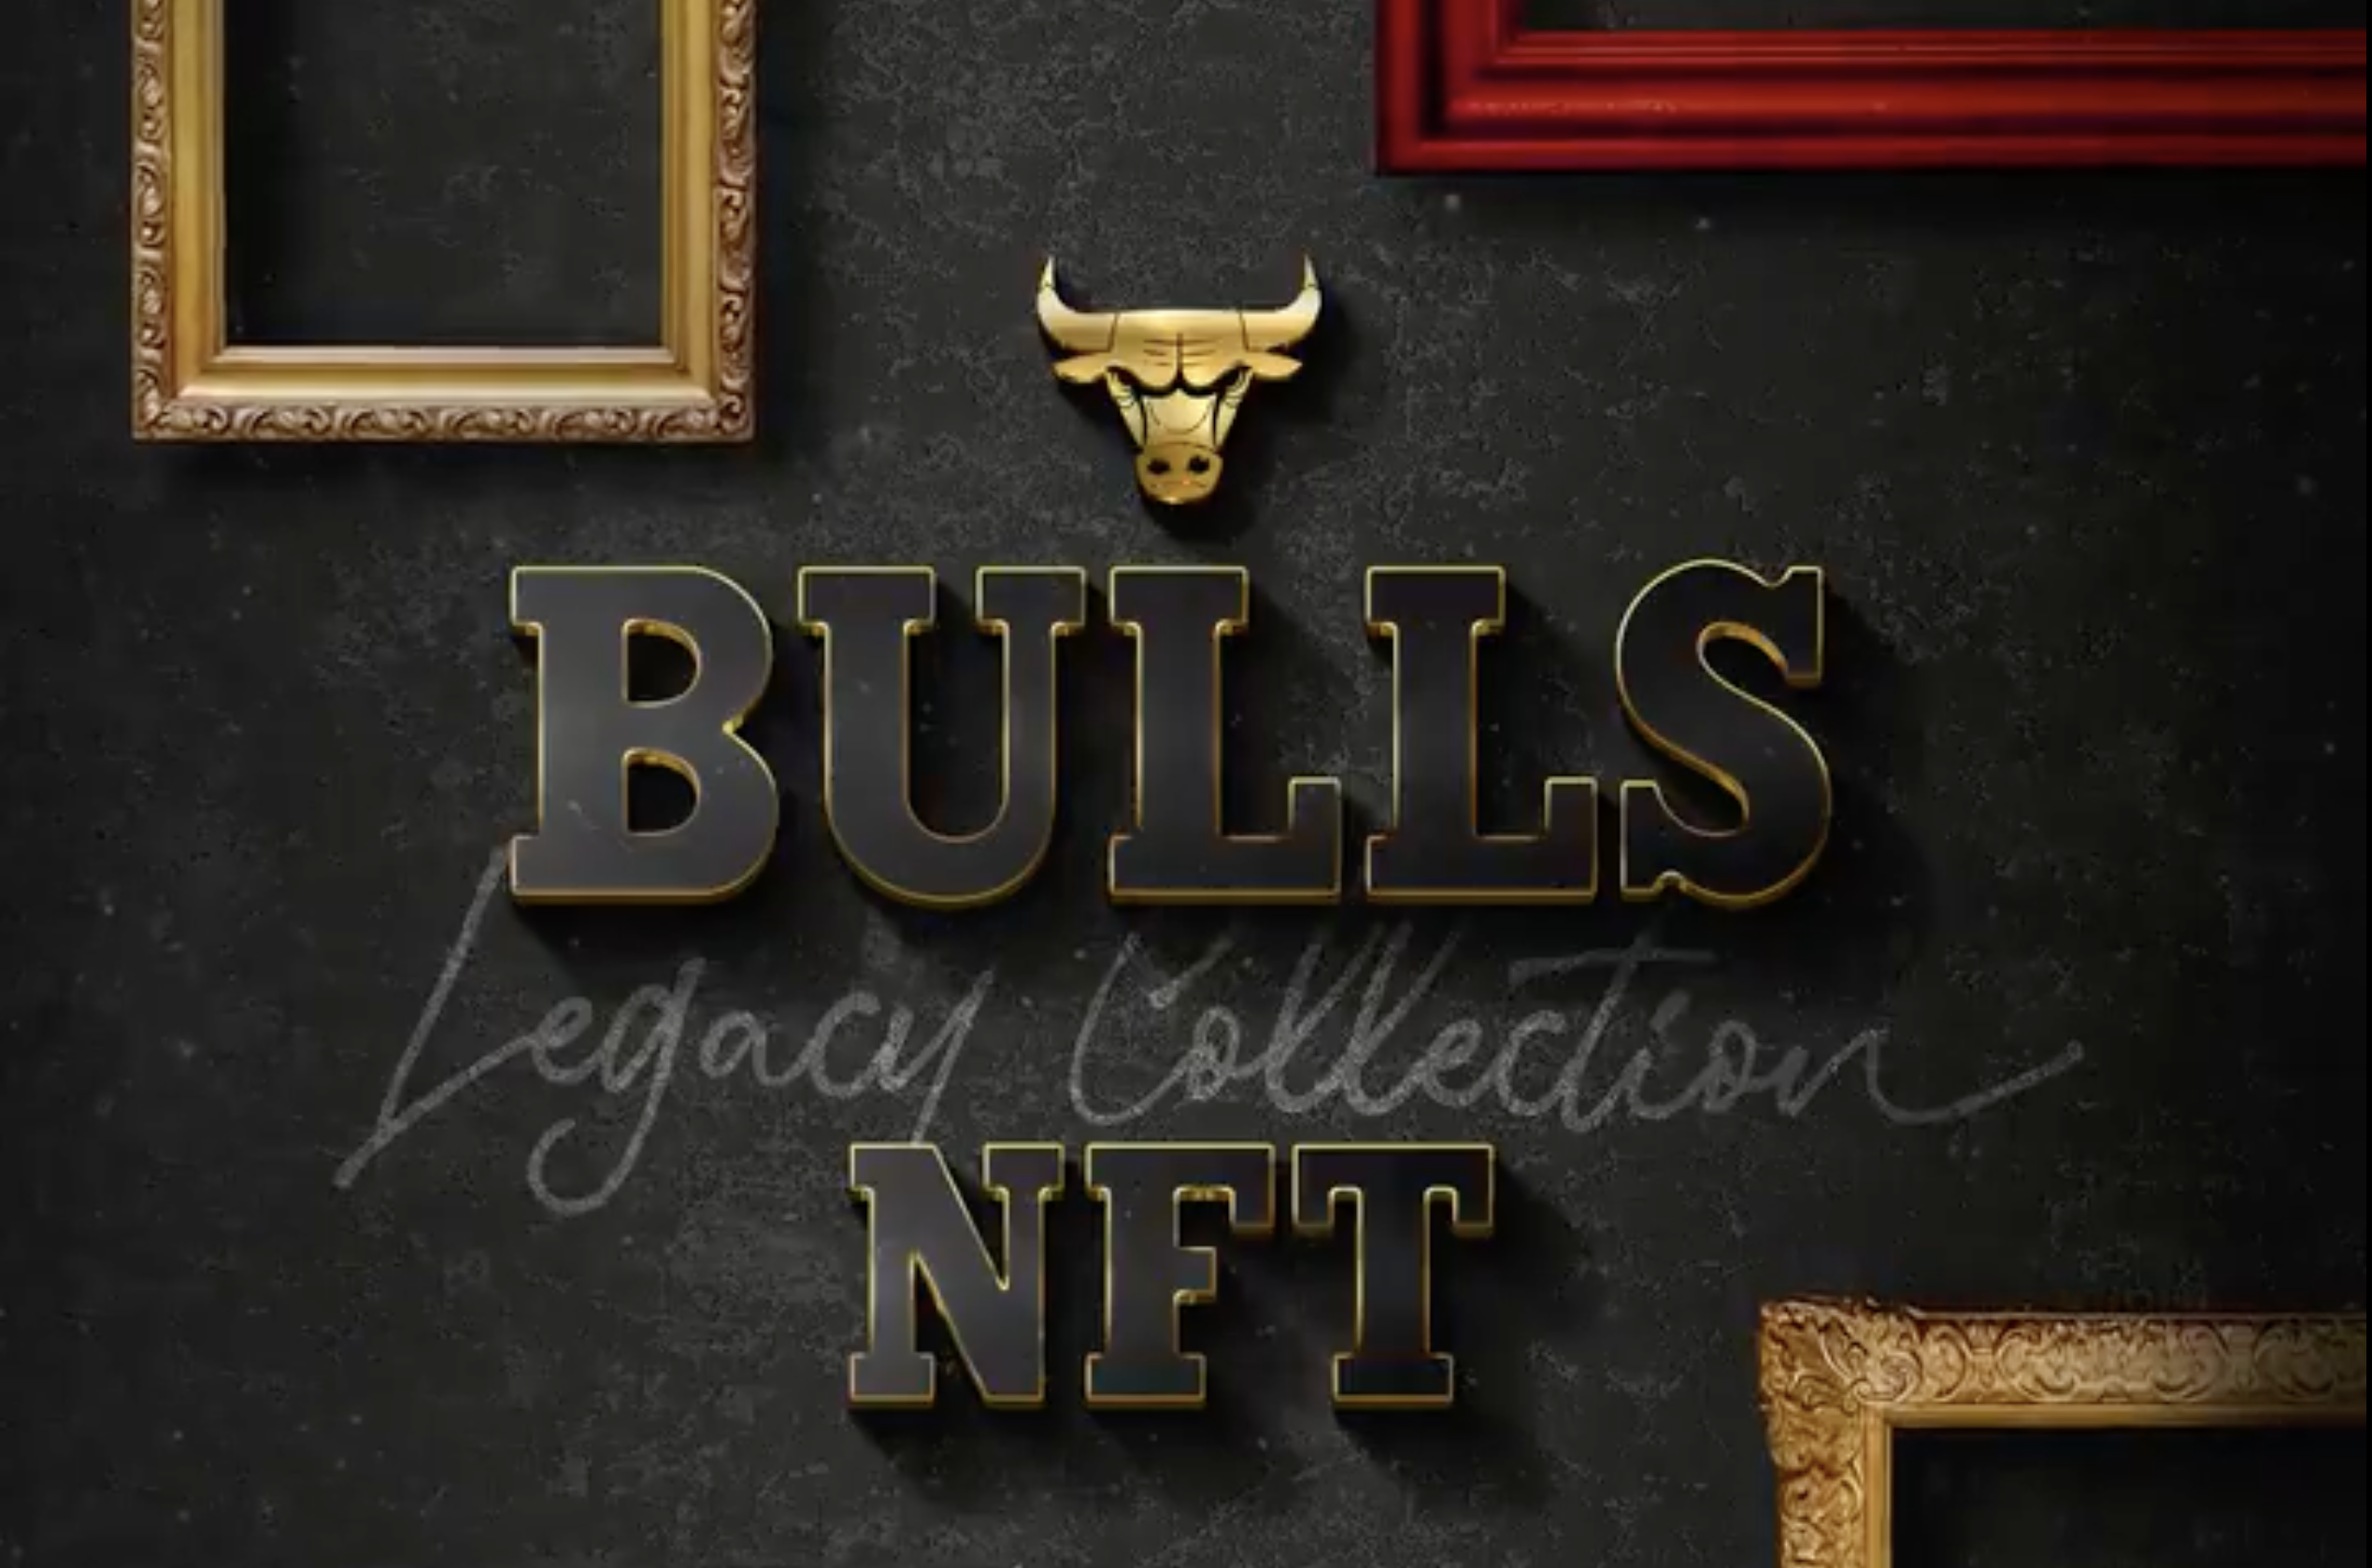 NBA芝加哥公牛隊頭香!Shopify 允許平台電商「直接」銷售 NFT,不需透過第三方市場